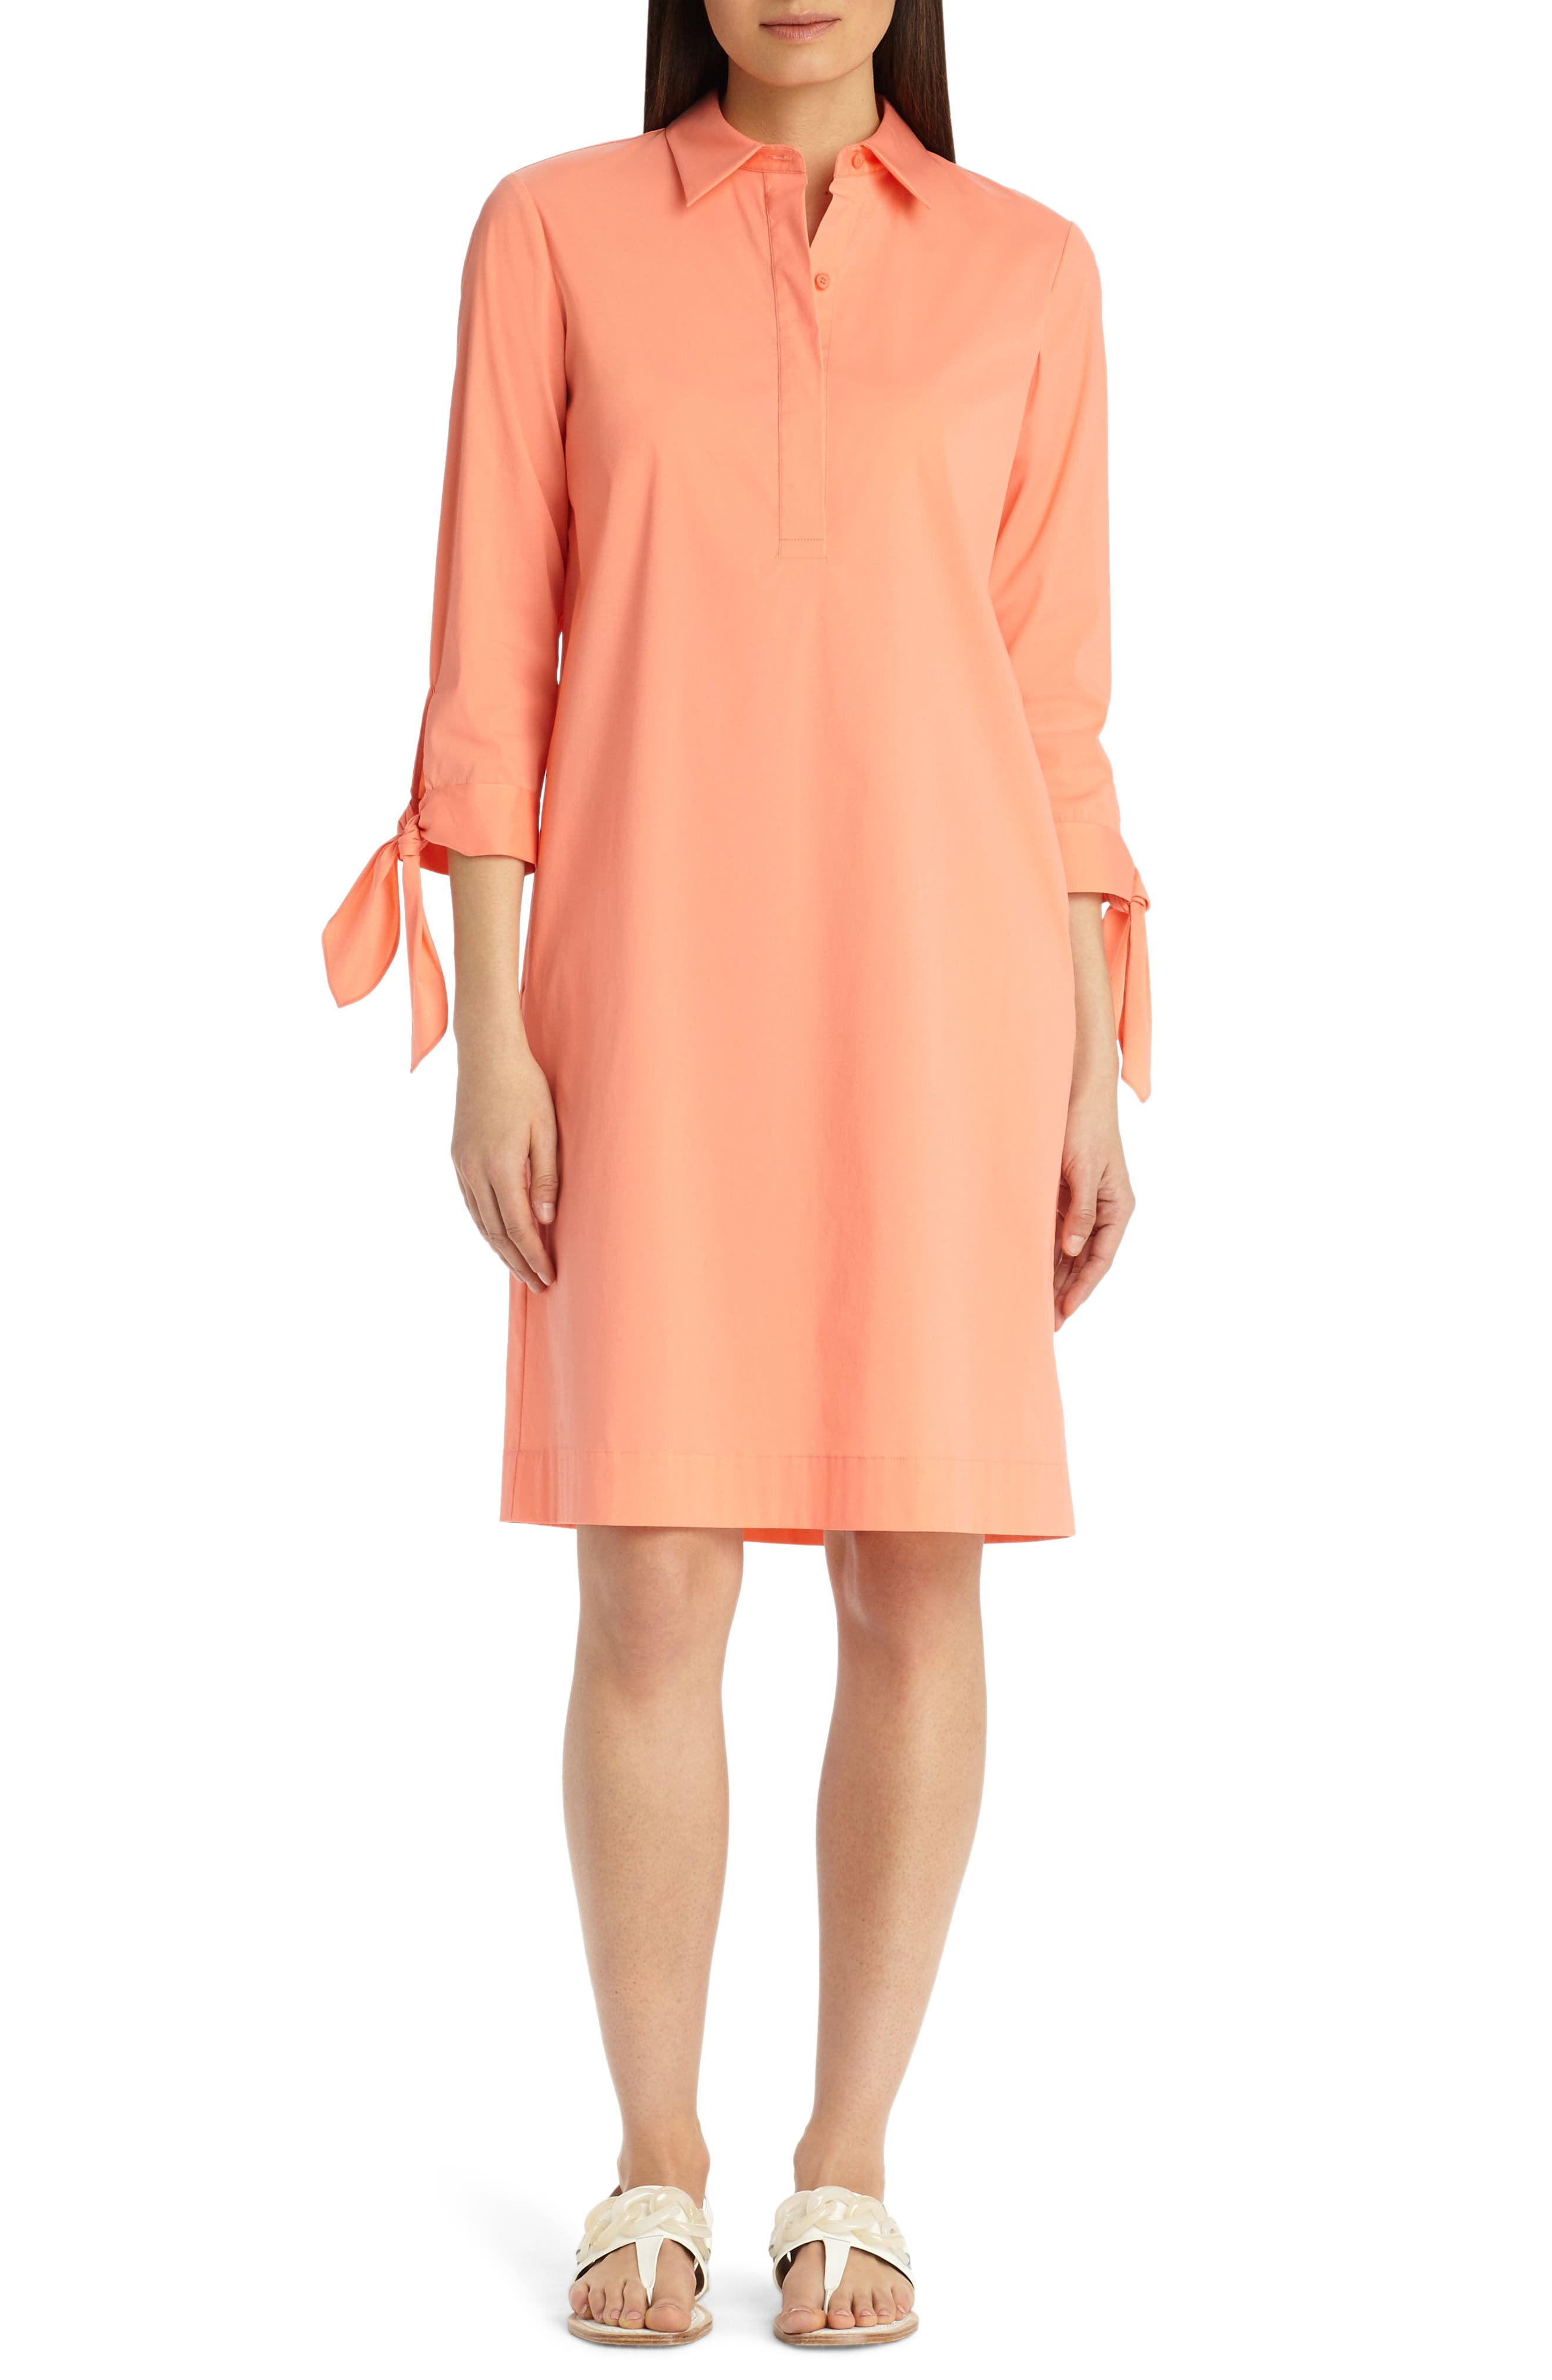 Lafayette 148 New York Talia Stretch Cotton Blend Dress